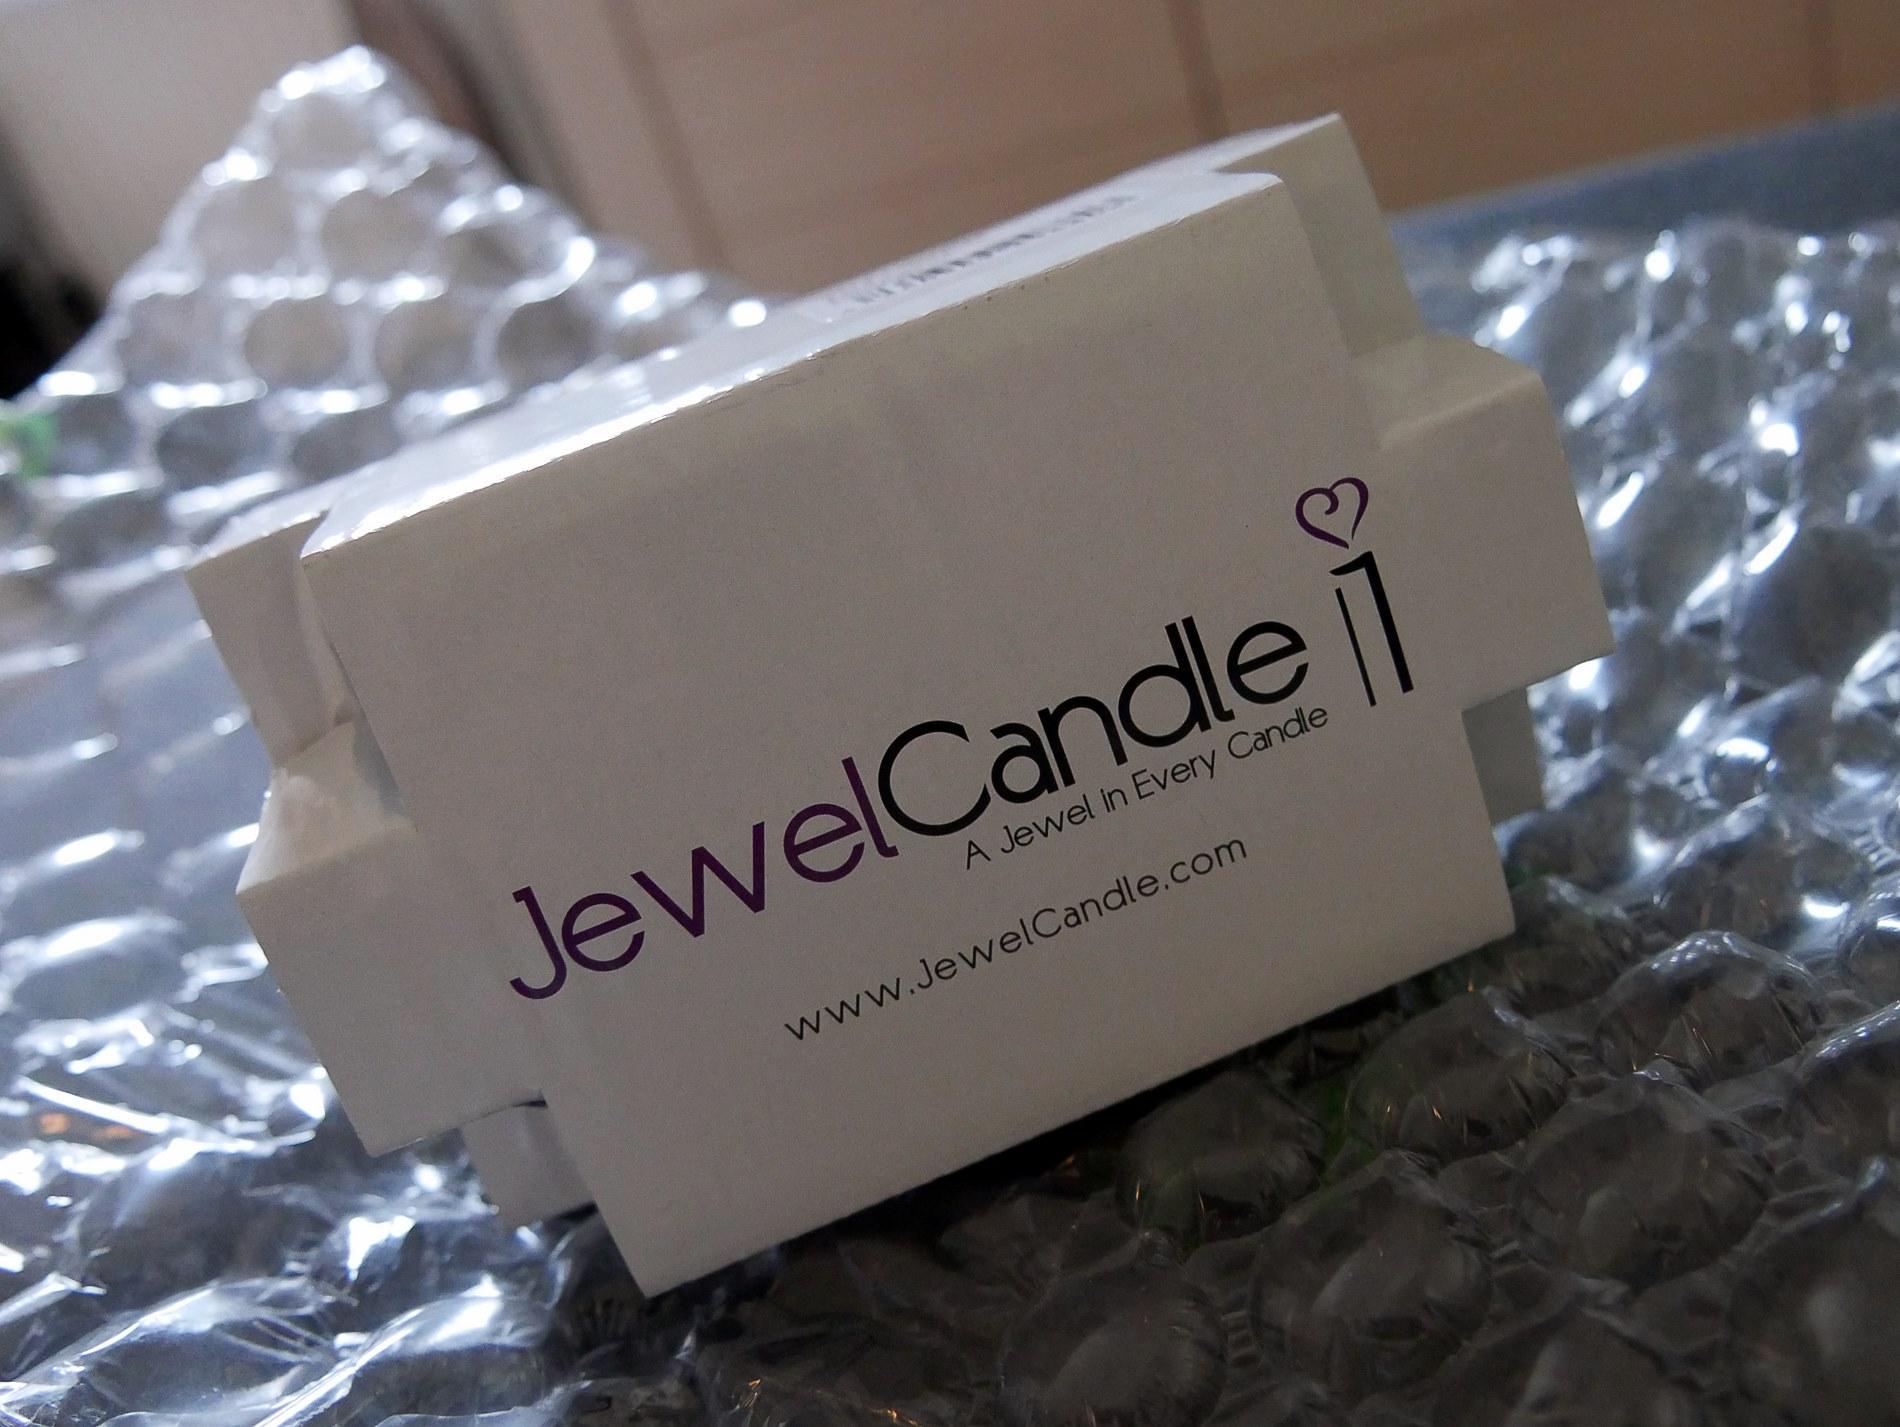 emballage jewelcandle 2 - juliesliberties